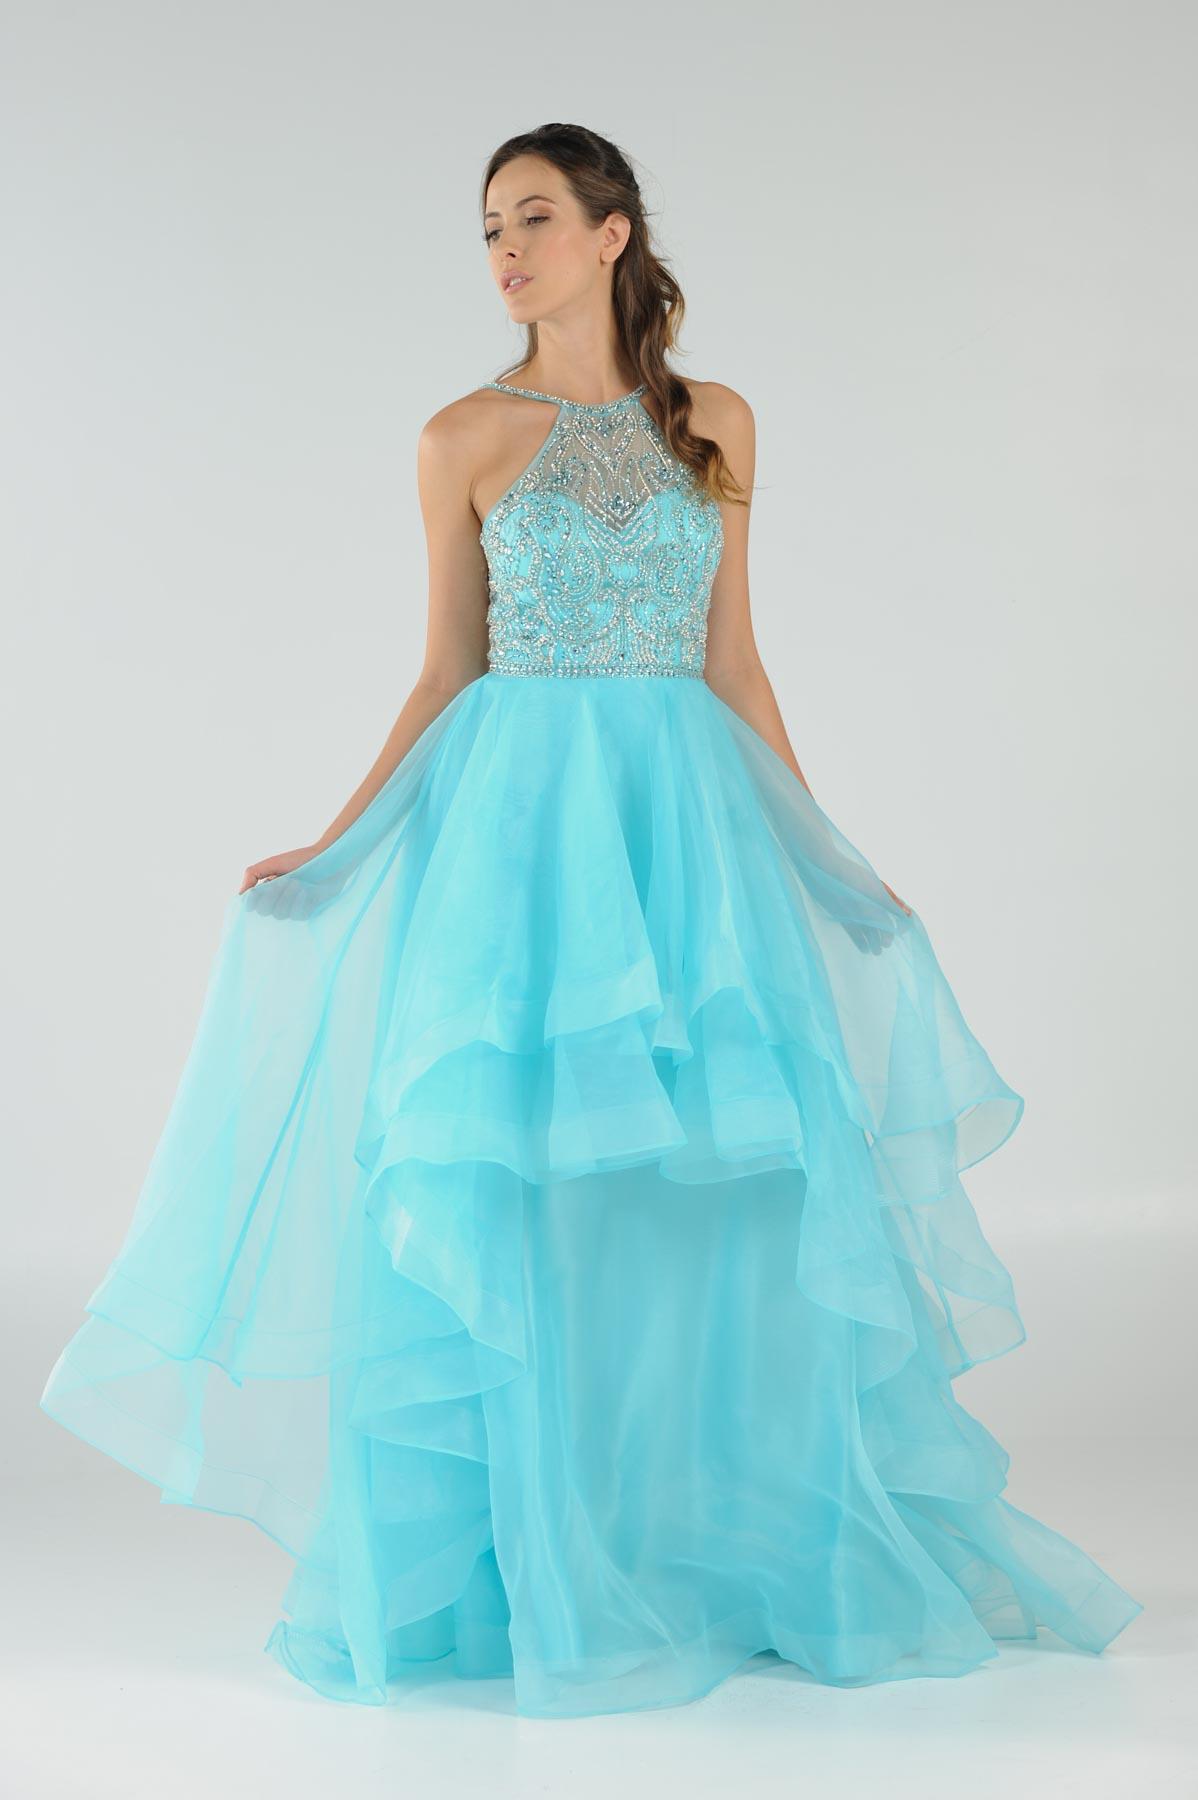 PROM DRESSES / PROM DRESSES / 8016